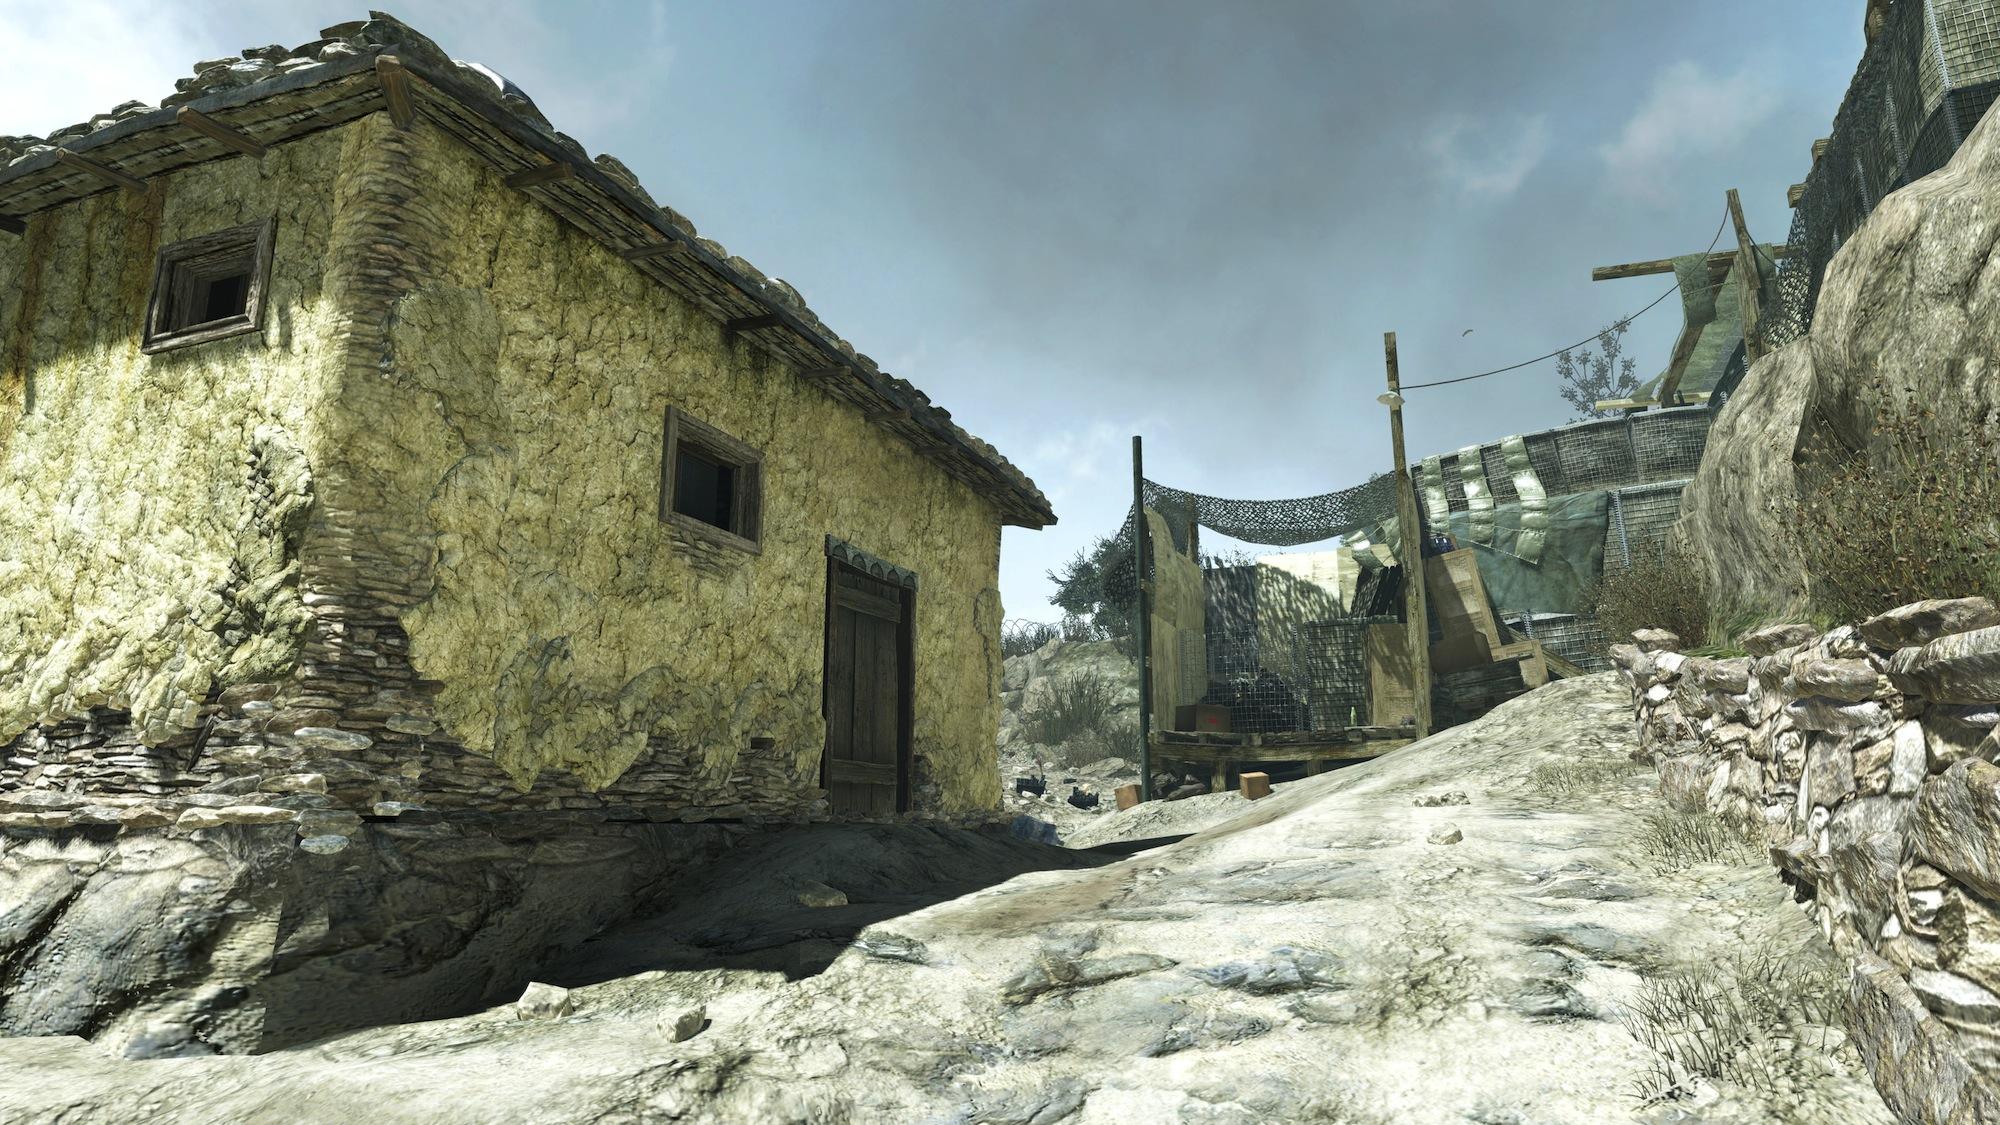 Lookout Call Of Duty Wiki Fandom Powered By Wikia